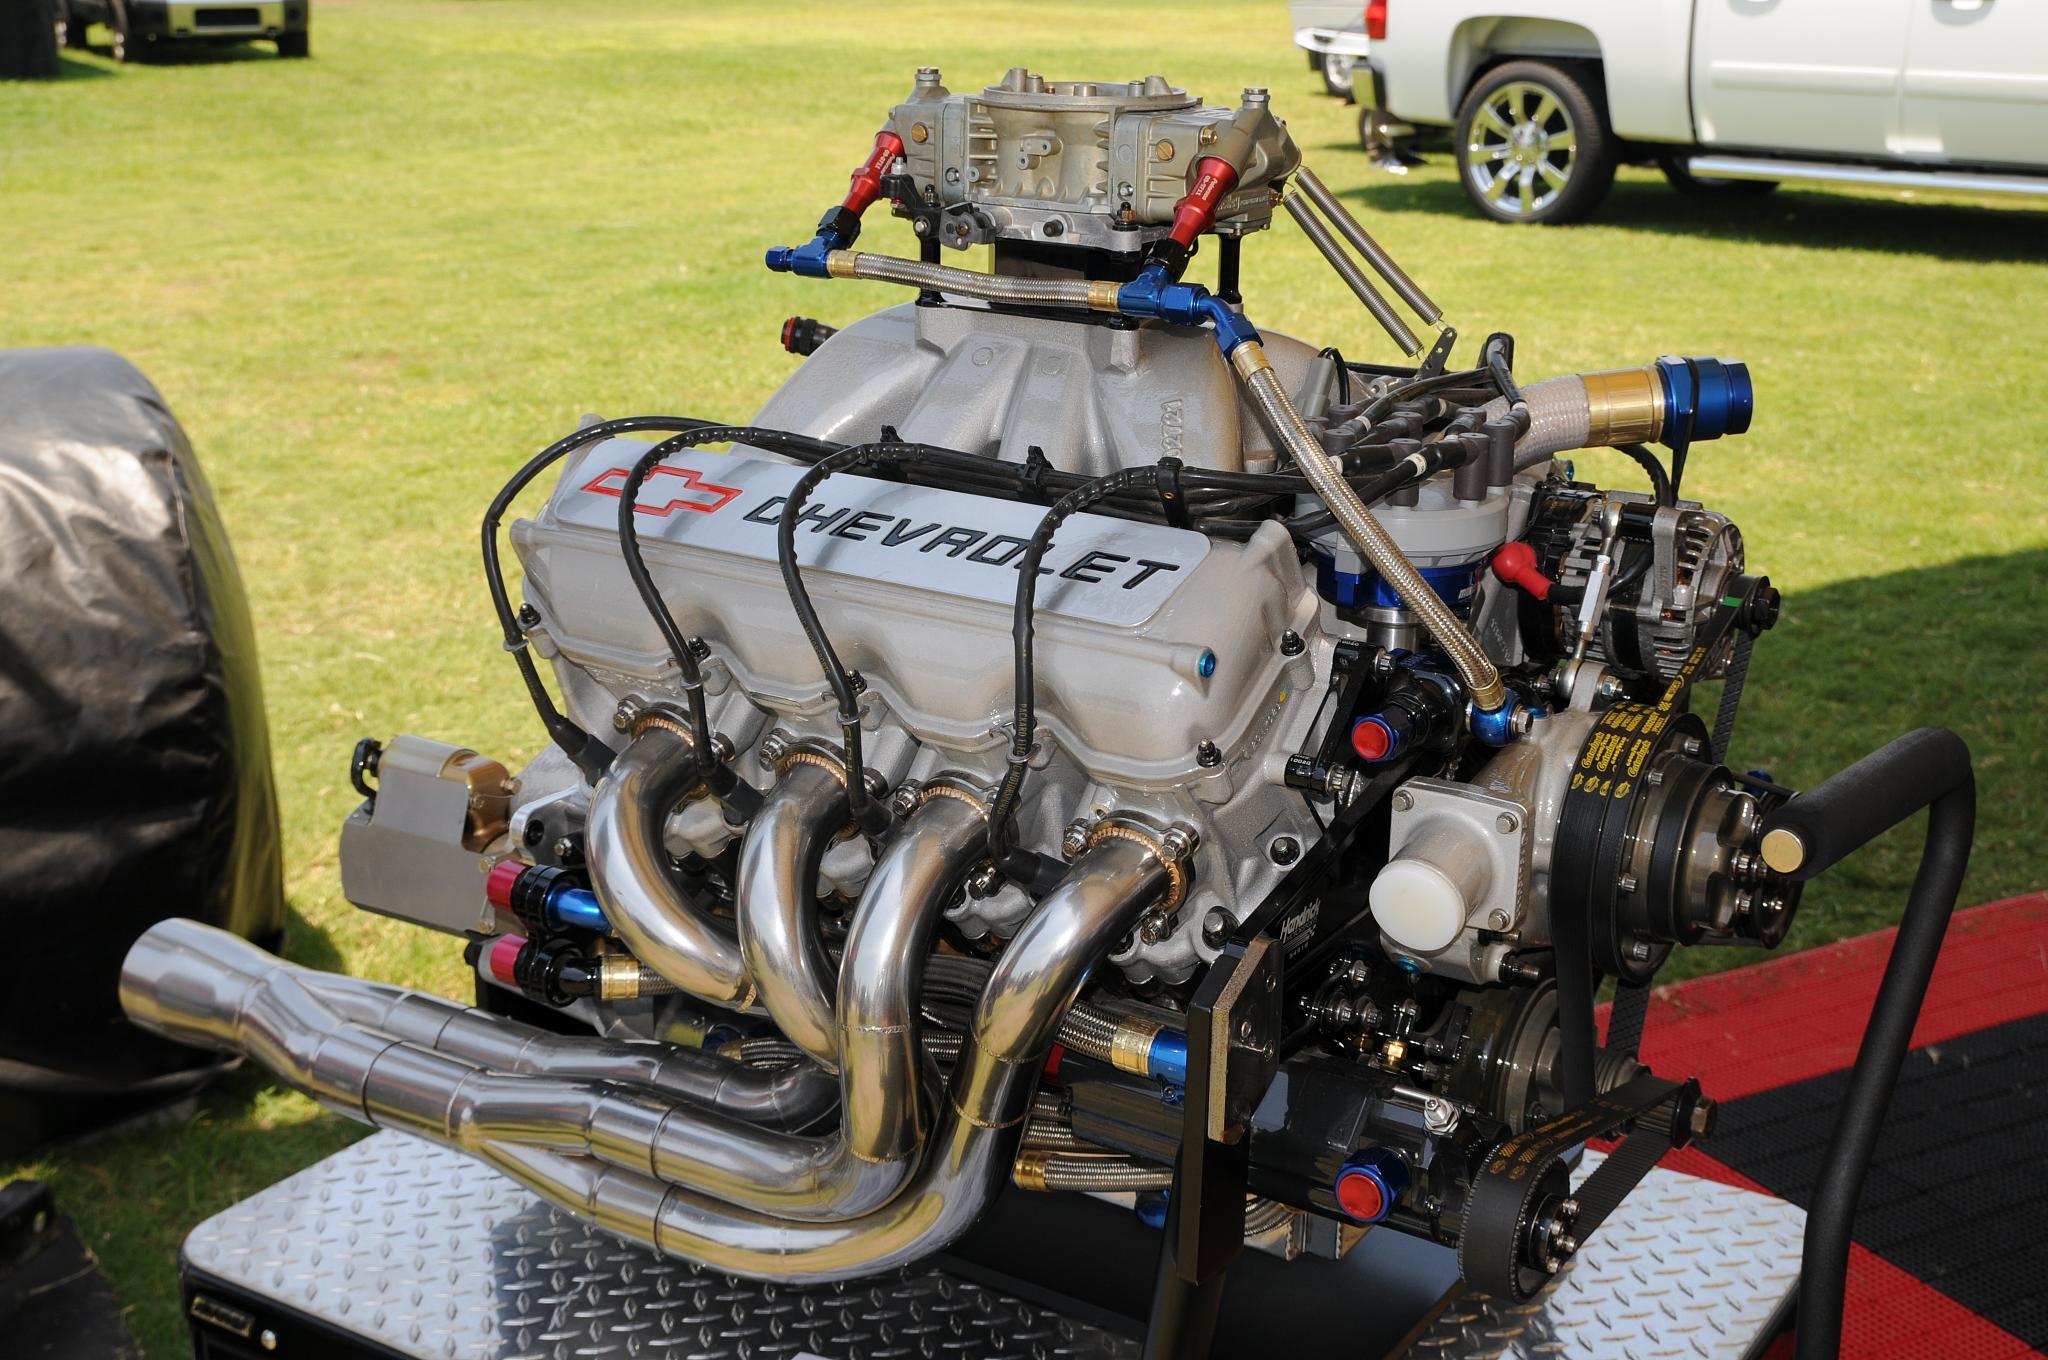 File:NASCAR motor.jpg - Wikimedia Commons